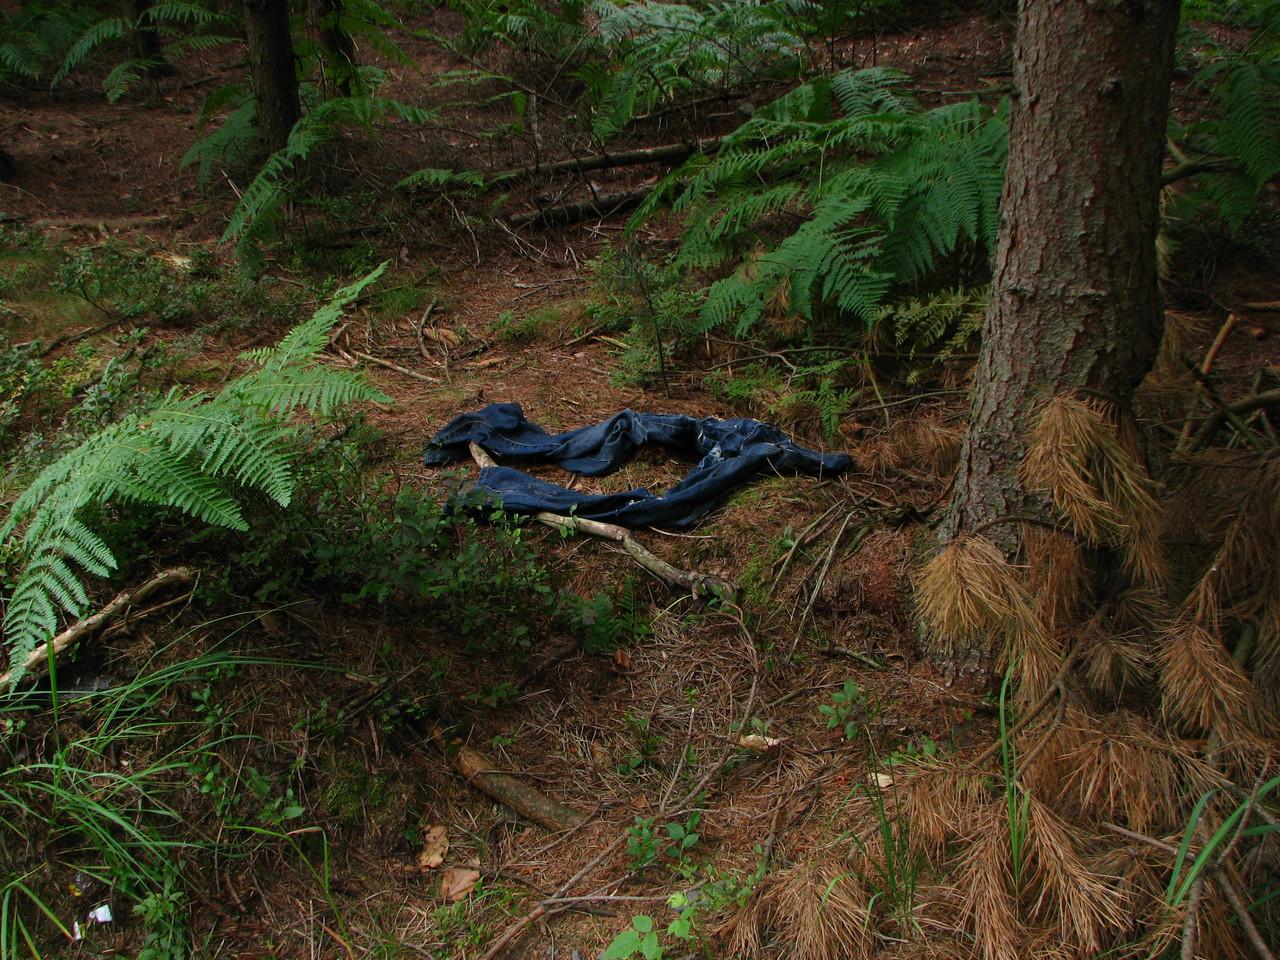 Hose im Wald